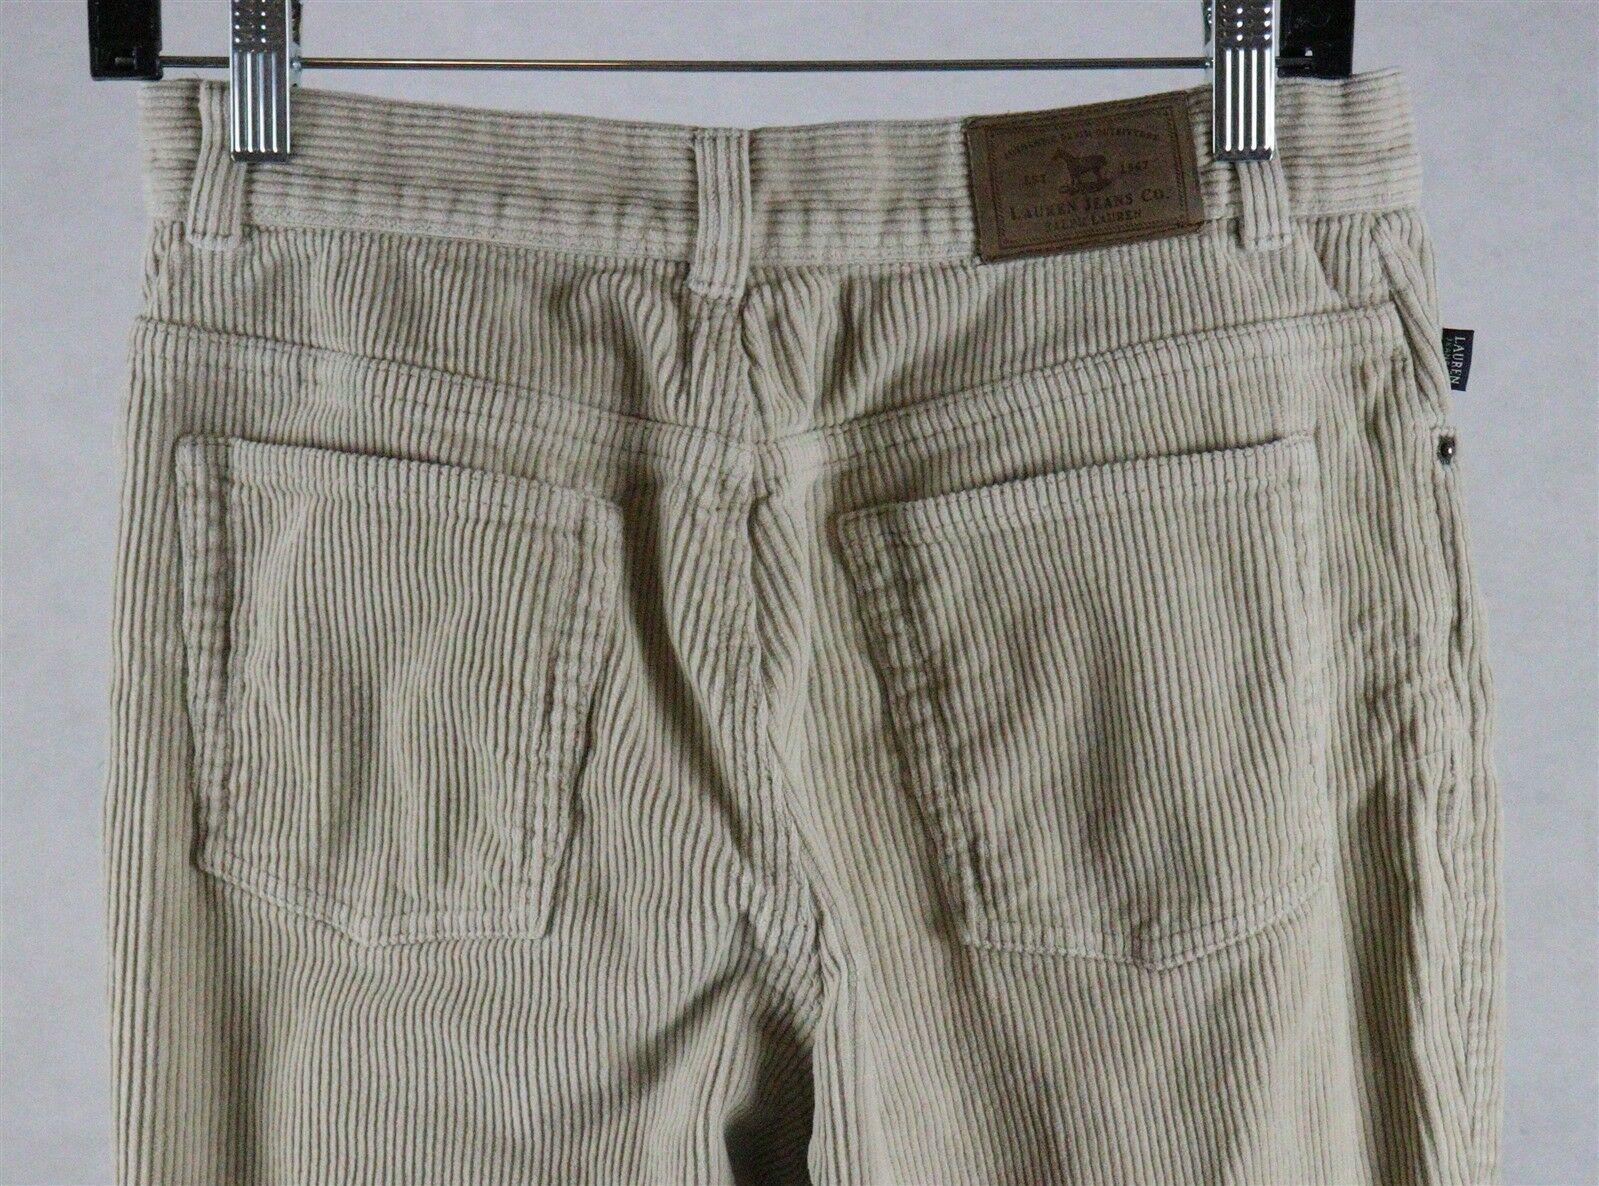 Ralph Lauren Jeans Company Womens Beige Corduroy Pants Size 6, Measures 28 x 30